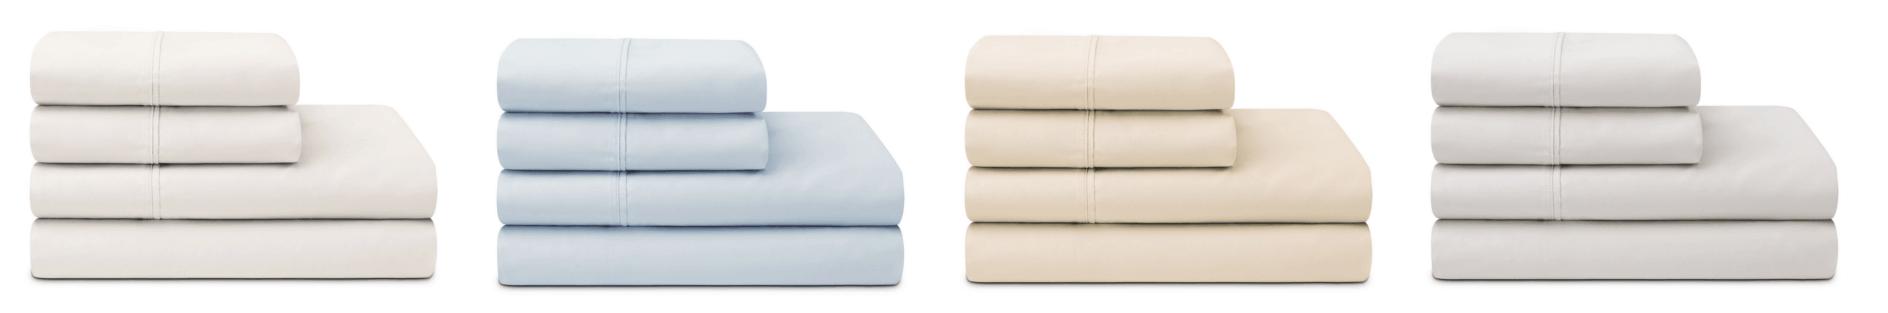 sleepletics sheet colors